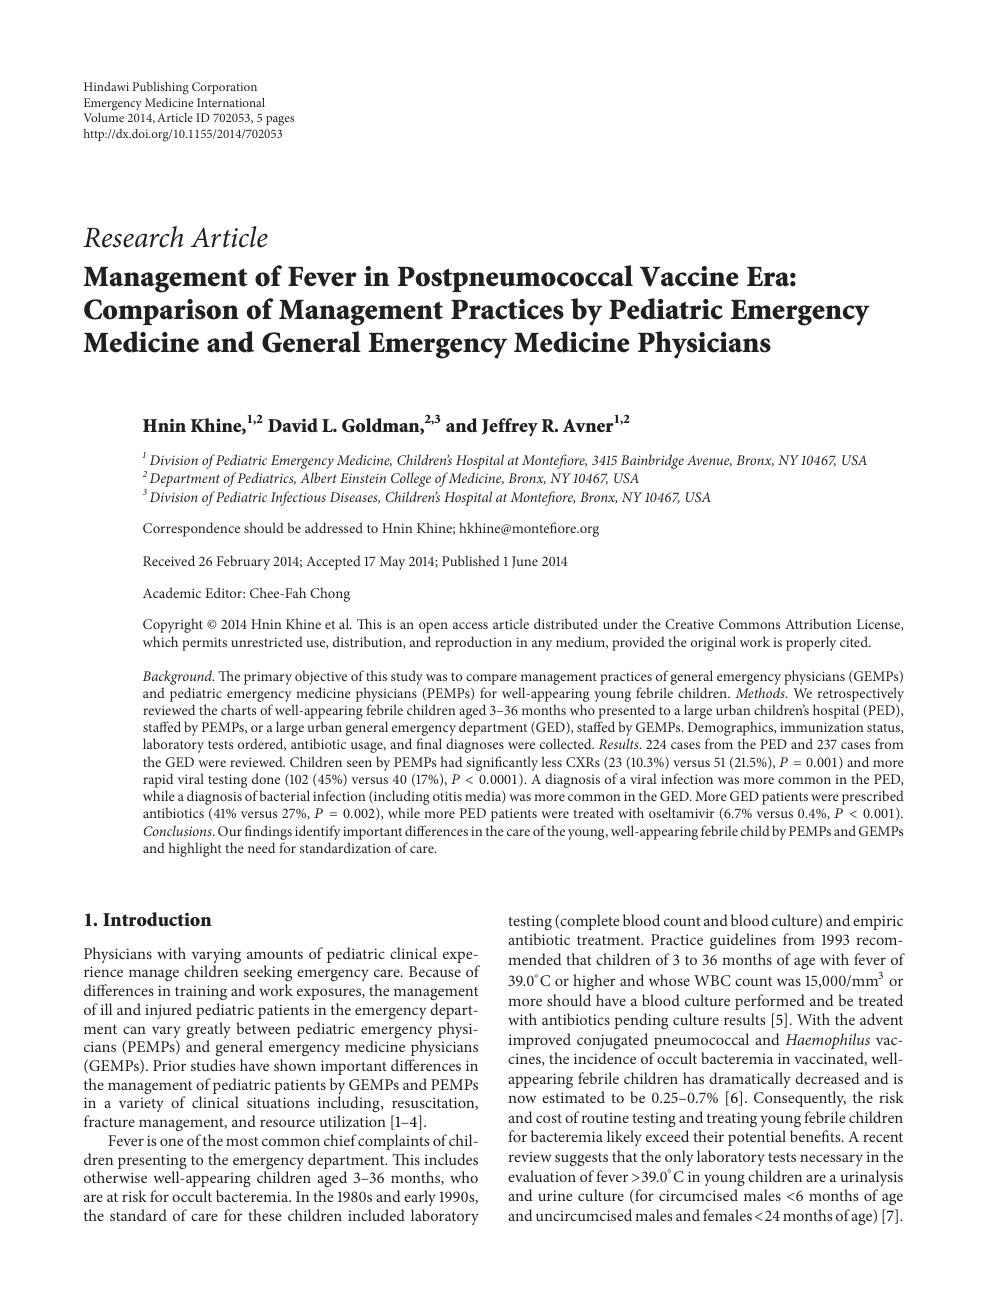 Management of Fever in Postpneumococcal Vaccine Era: Comparison of